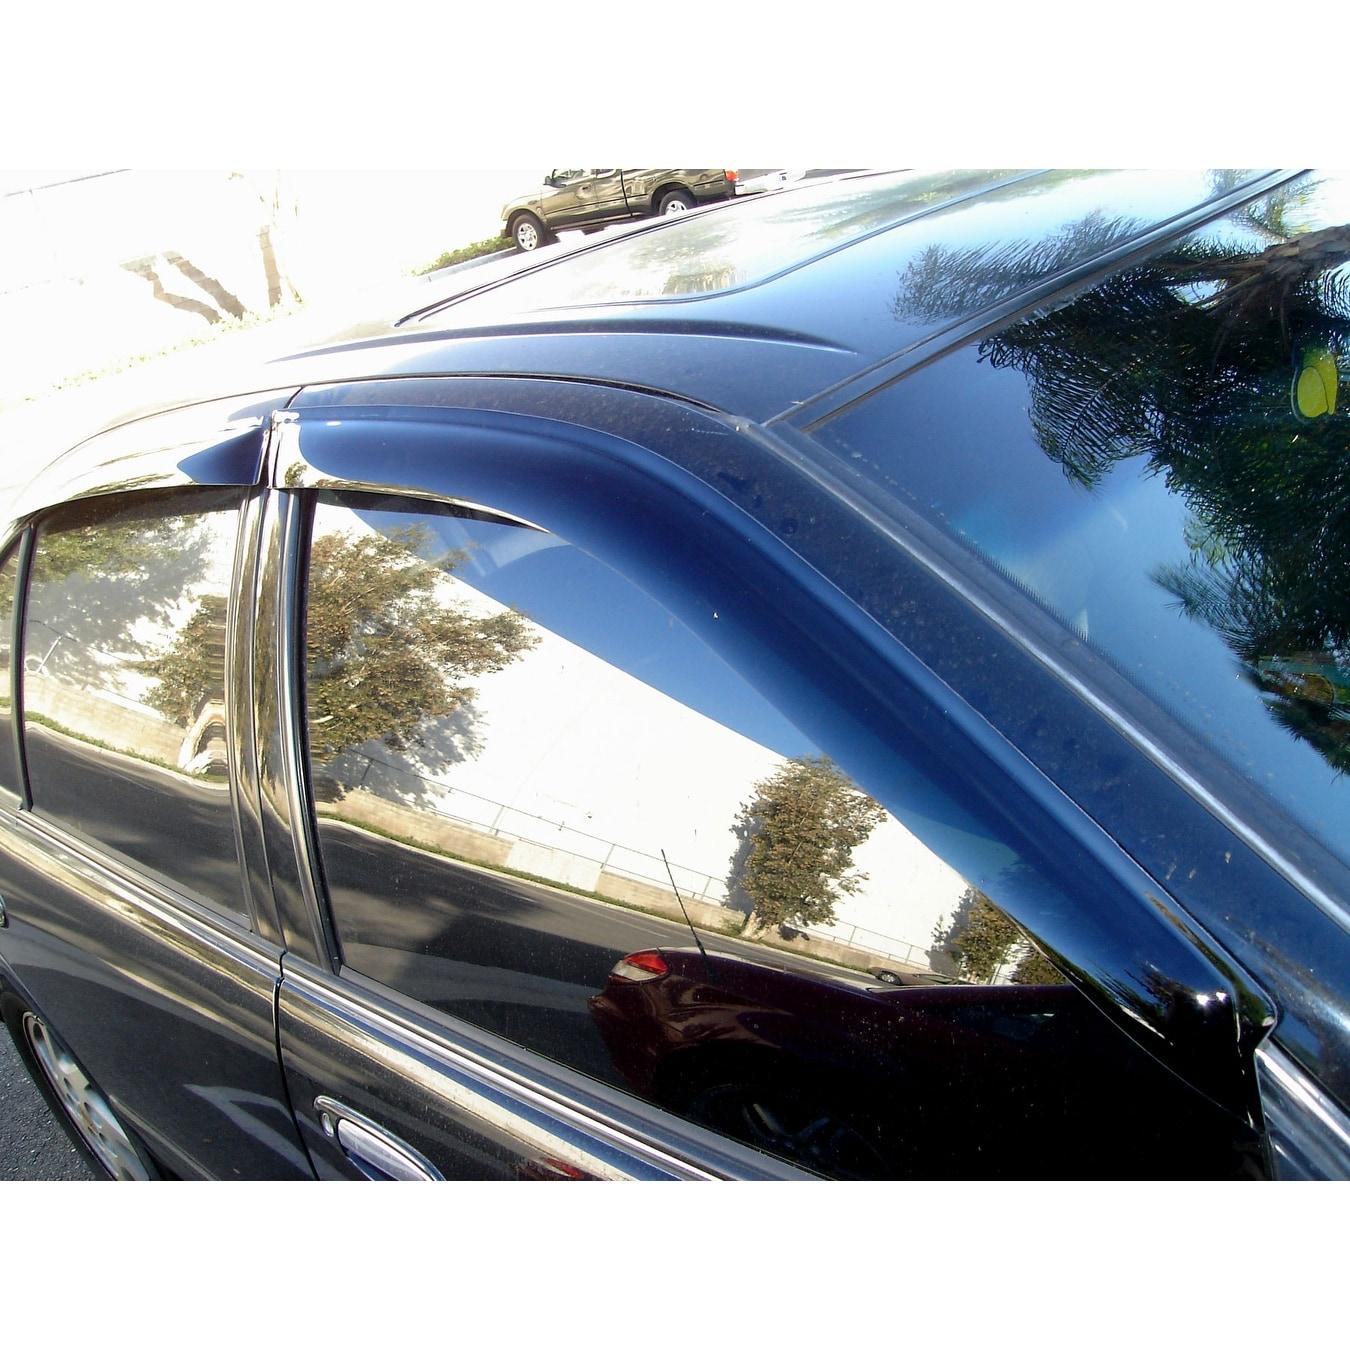 Tuningpros Wv 484 2 Window Visor For 2004 2006 Nissan Sentra Outside Mount Deflector 4 Pcs Set Nissan Sentra 04 05 06 Overstock 15277473